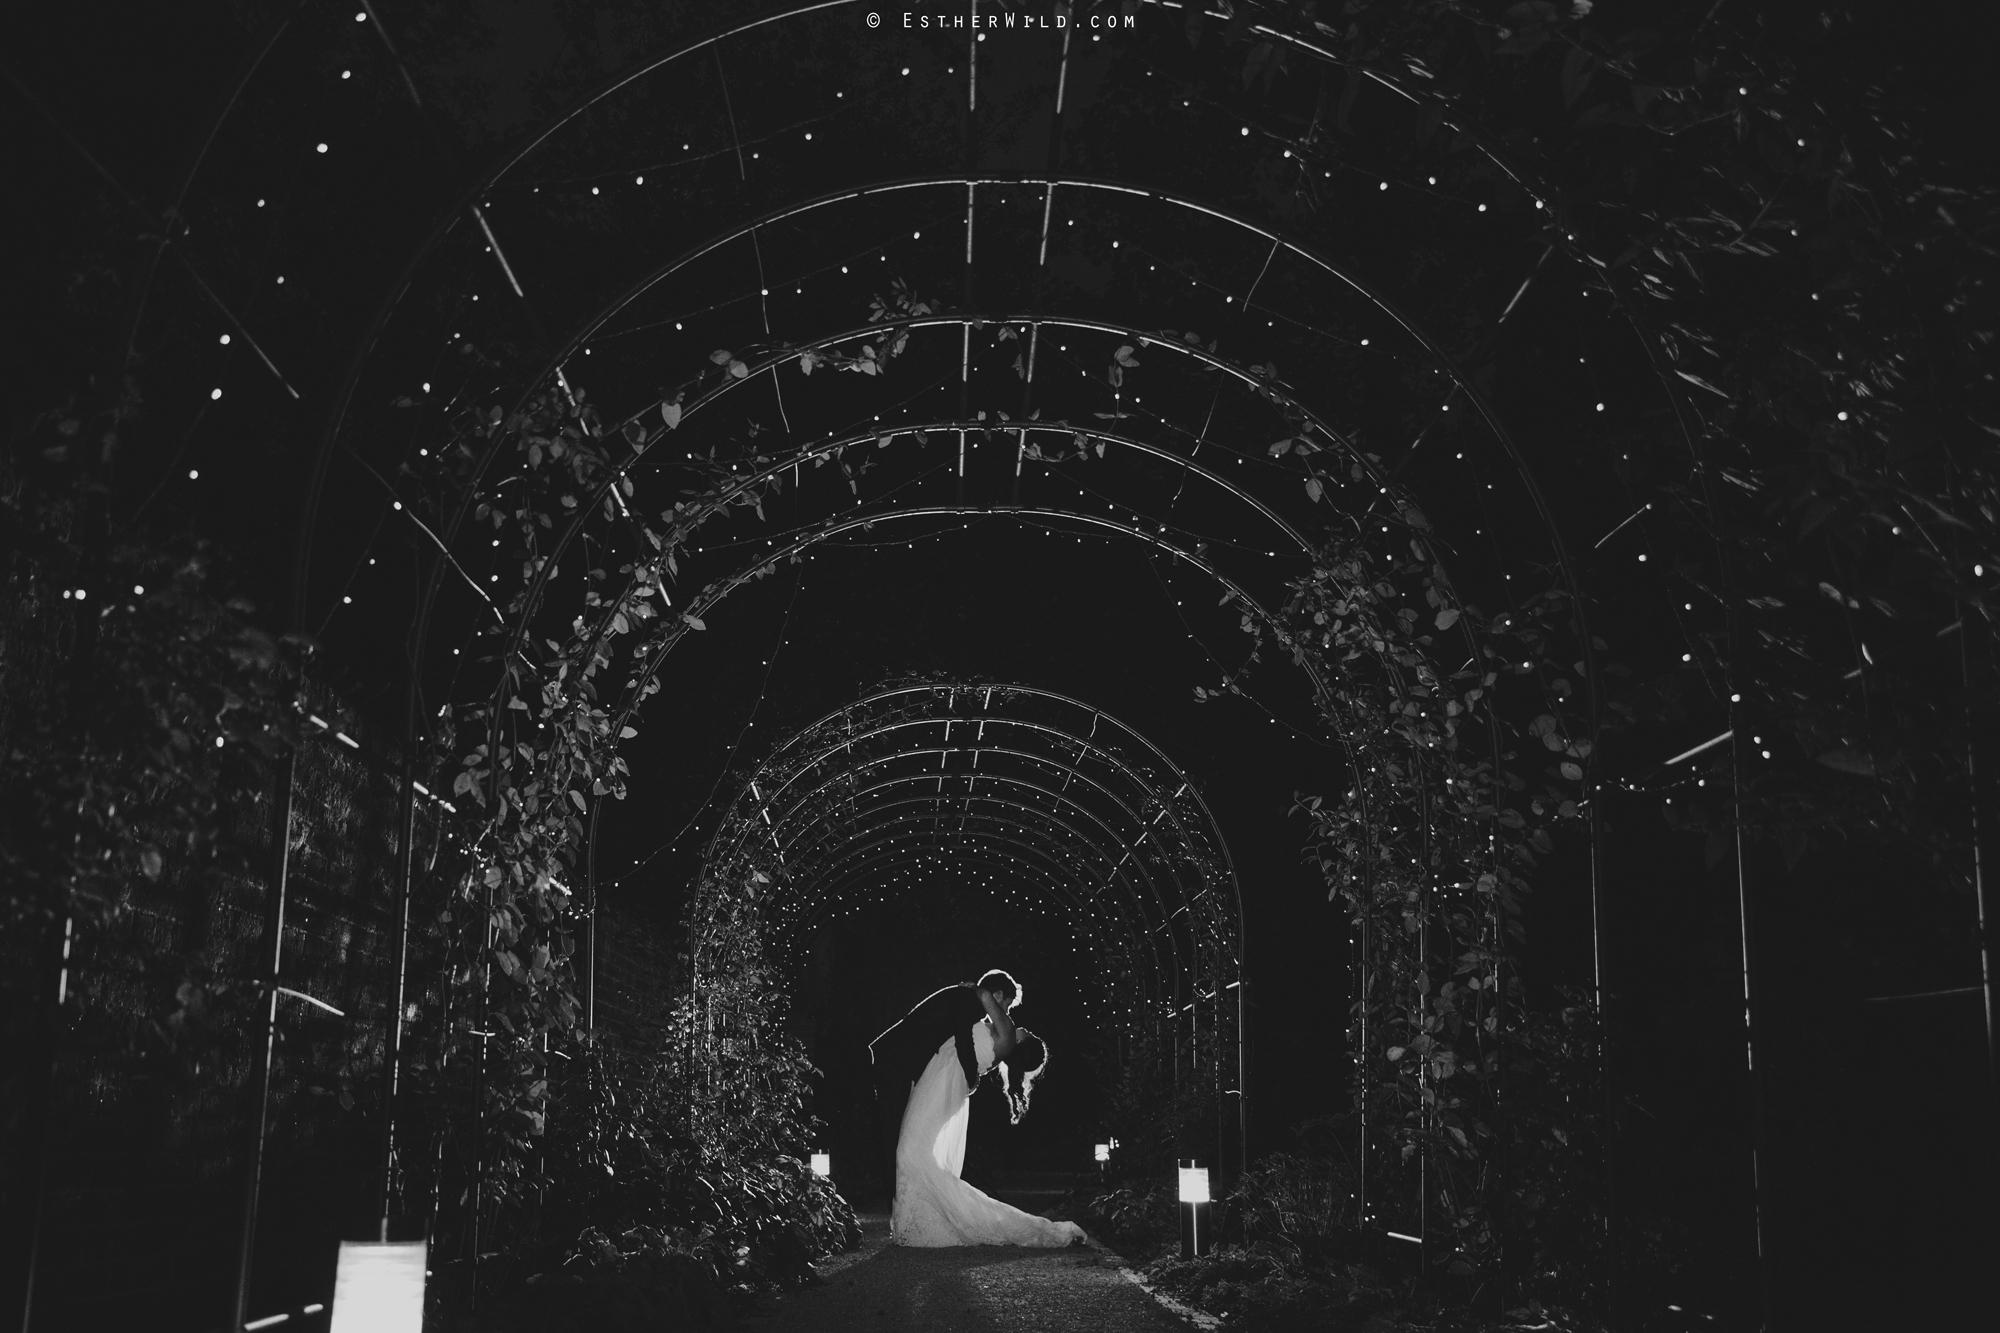 Reading_Room_Weddings_Alby_Norwich_Photographer_Esther_Wild_IMG_2788-1.jpg